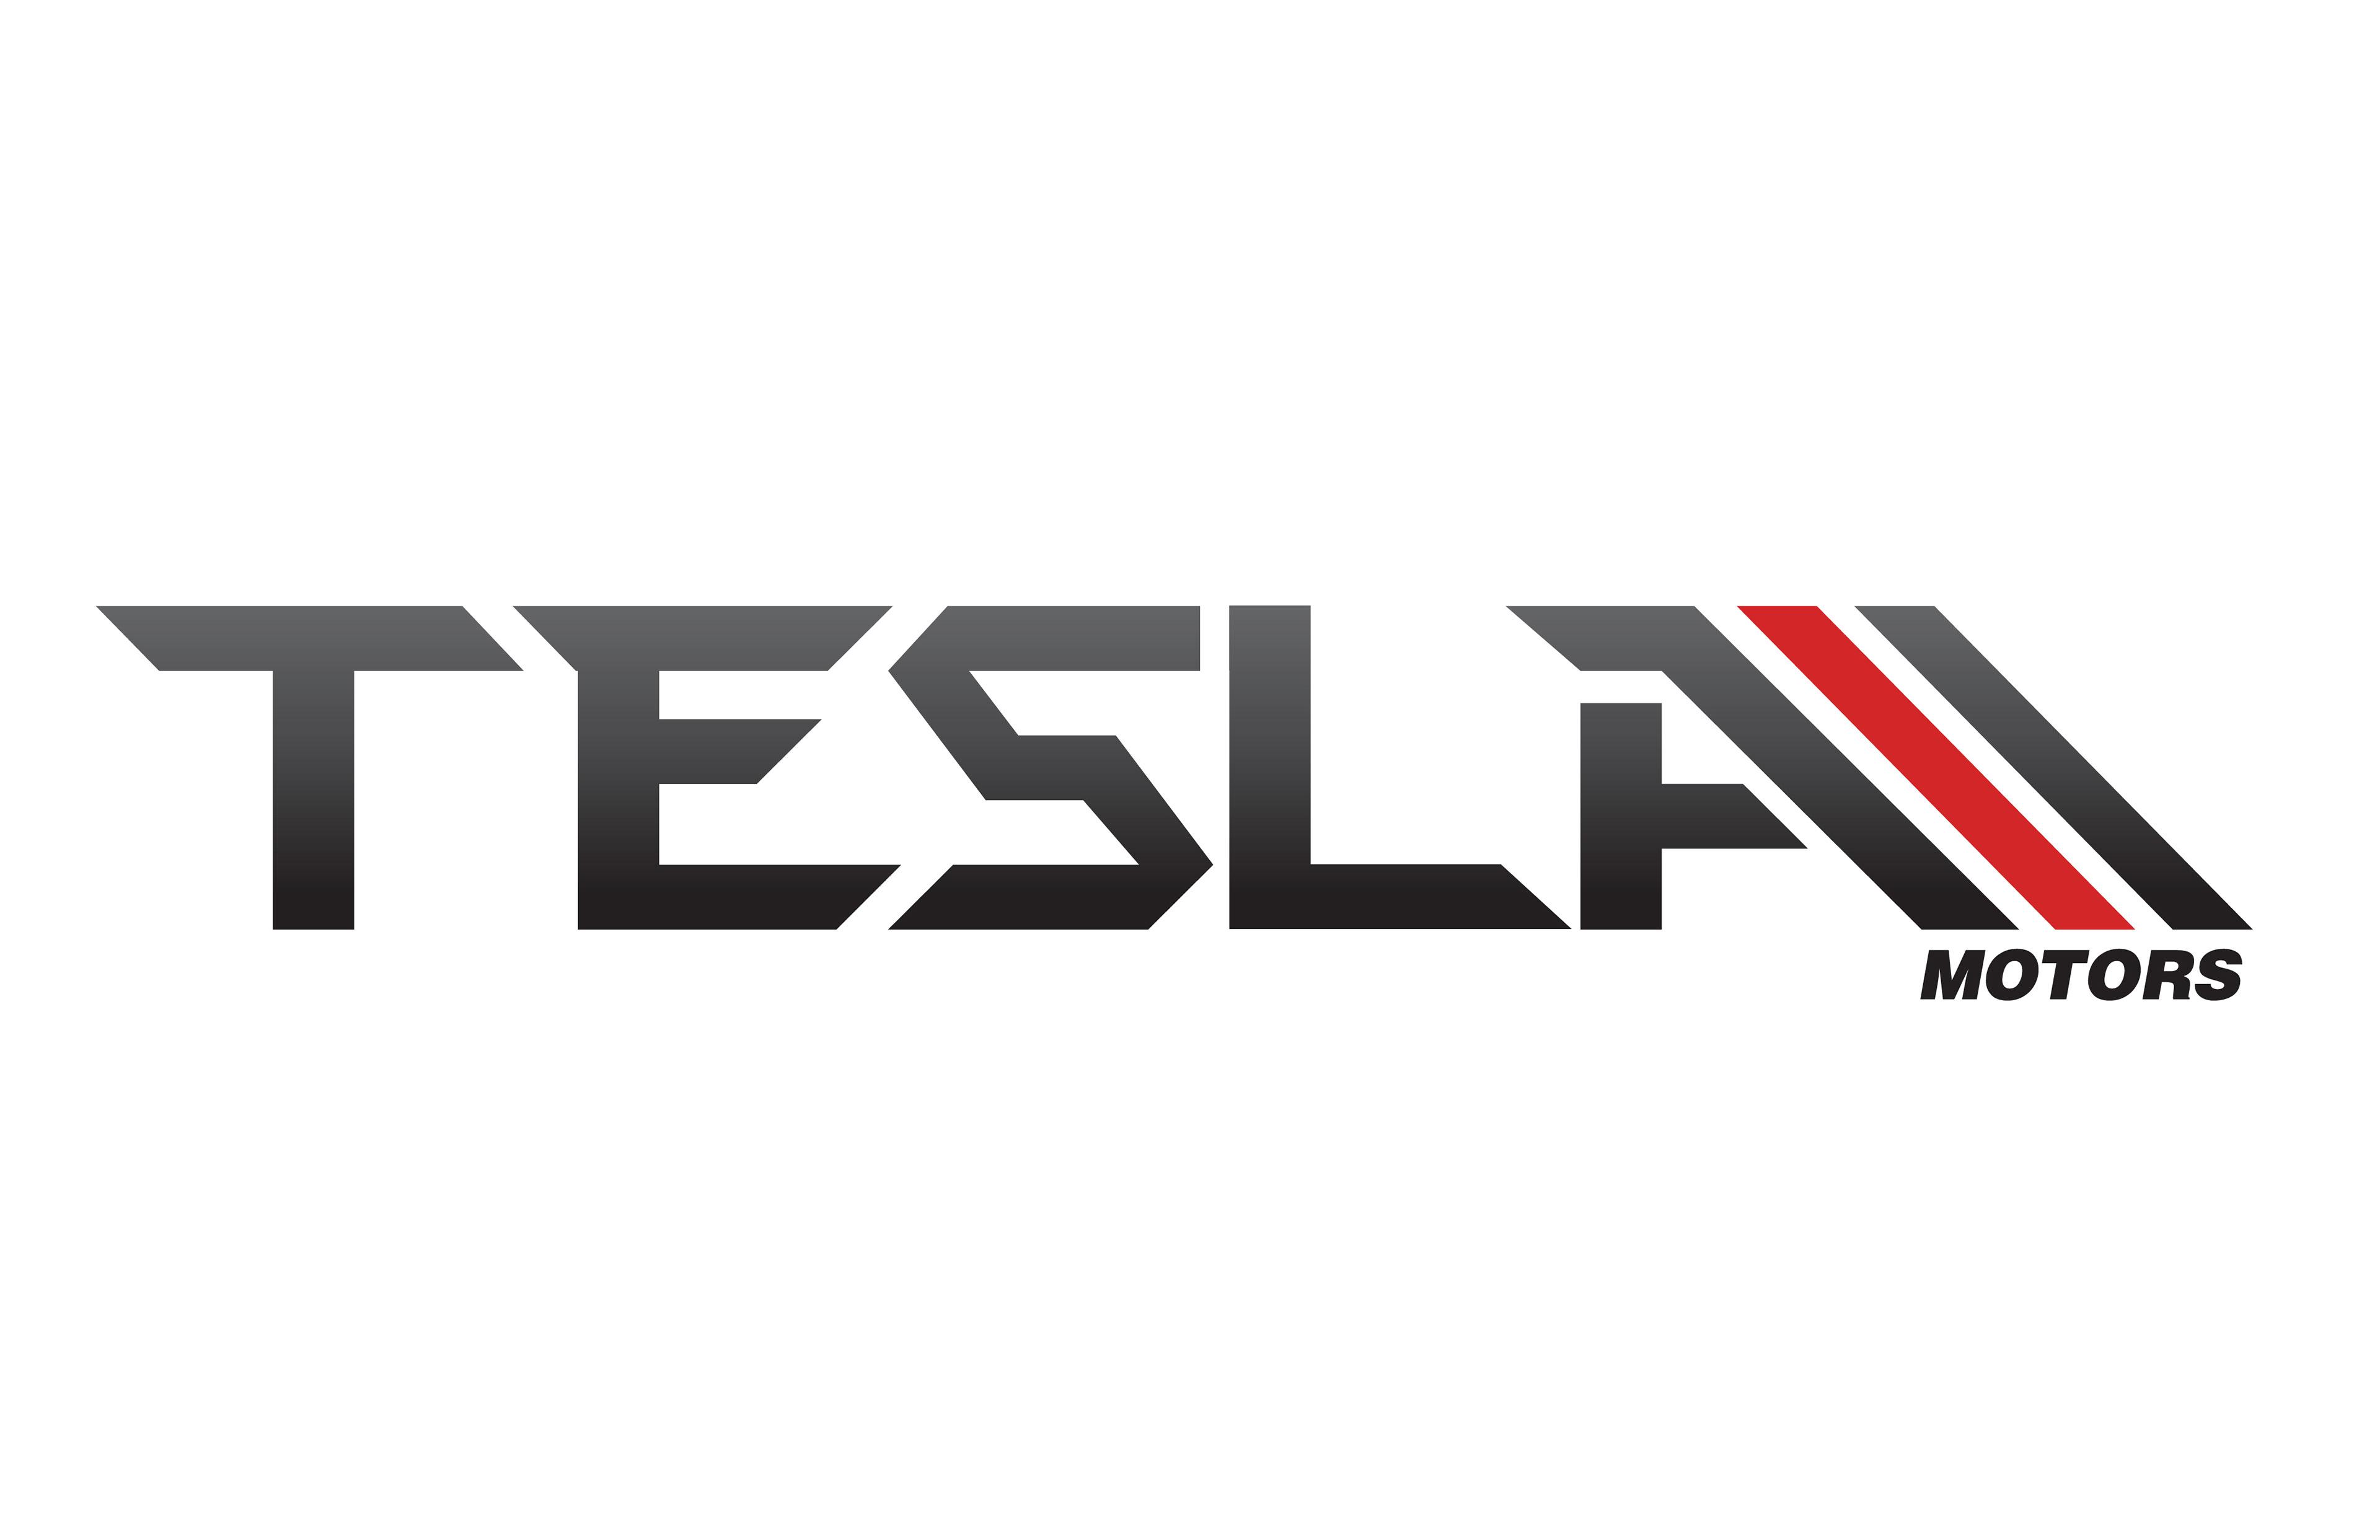 Tesla Motors Annual Report Branding, Editorial & Print Design. CSUN - Student Work